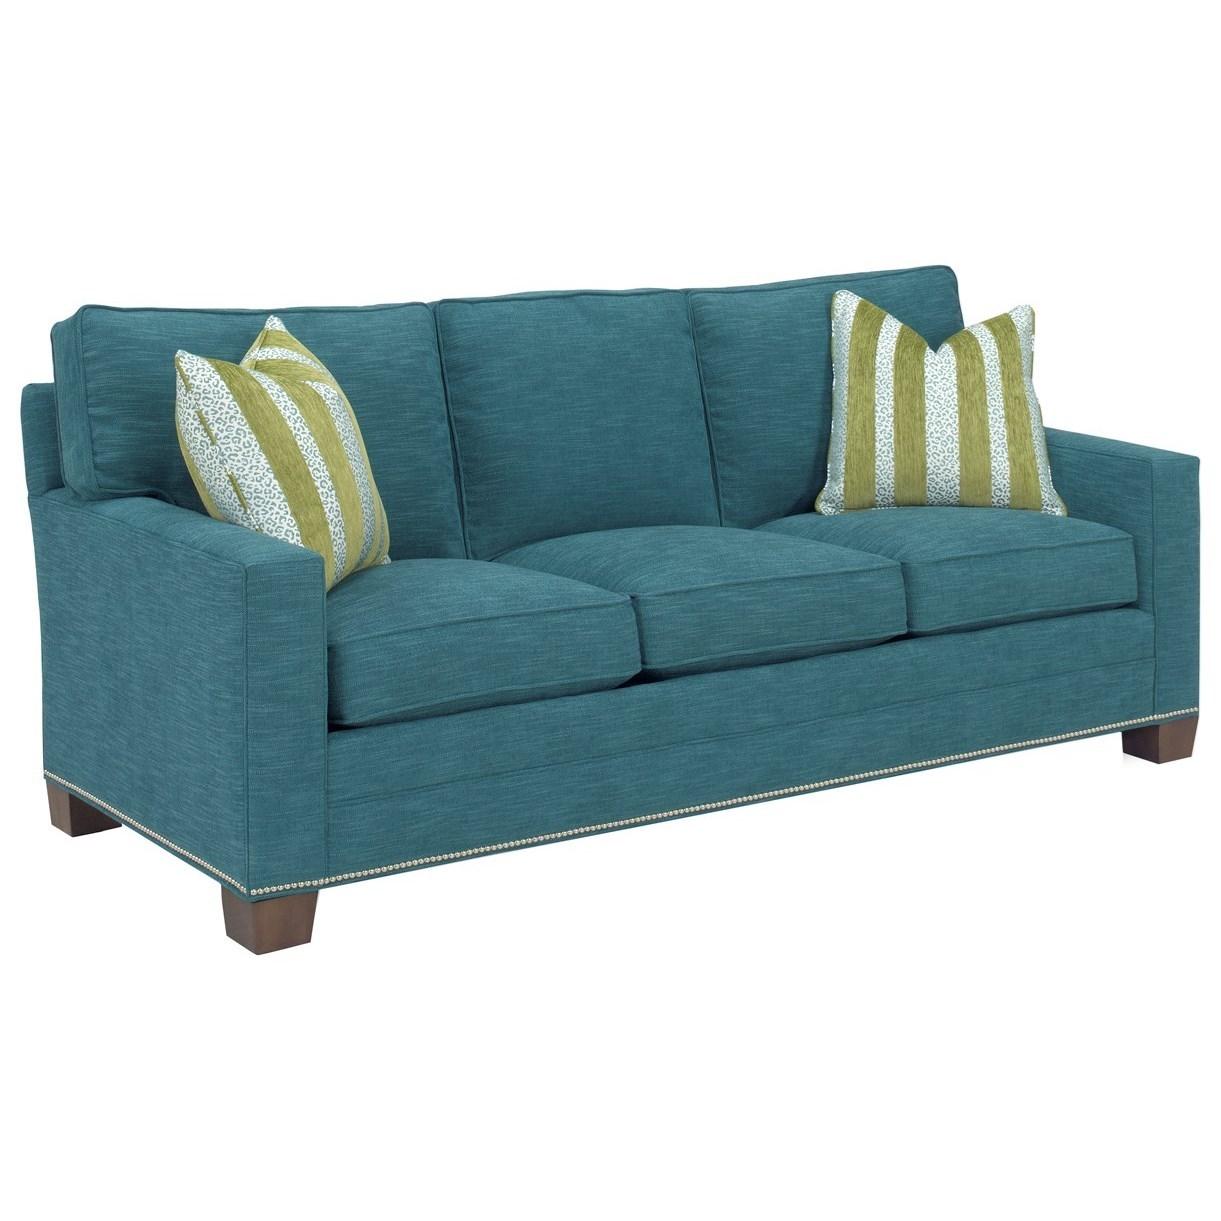 Personal Design Series Bristol Customizable Sofa by Lexington at Baer's Furniture